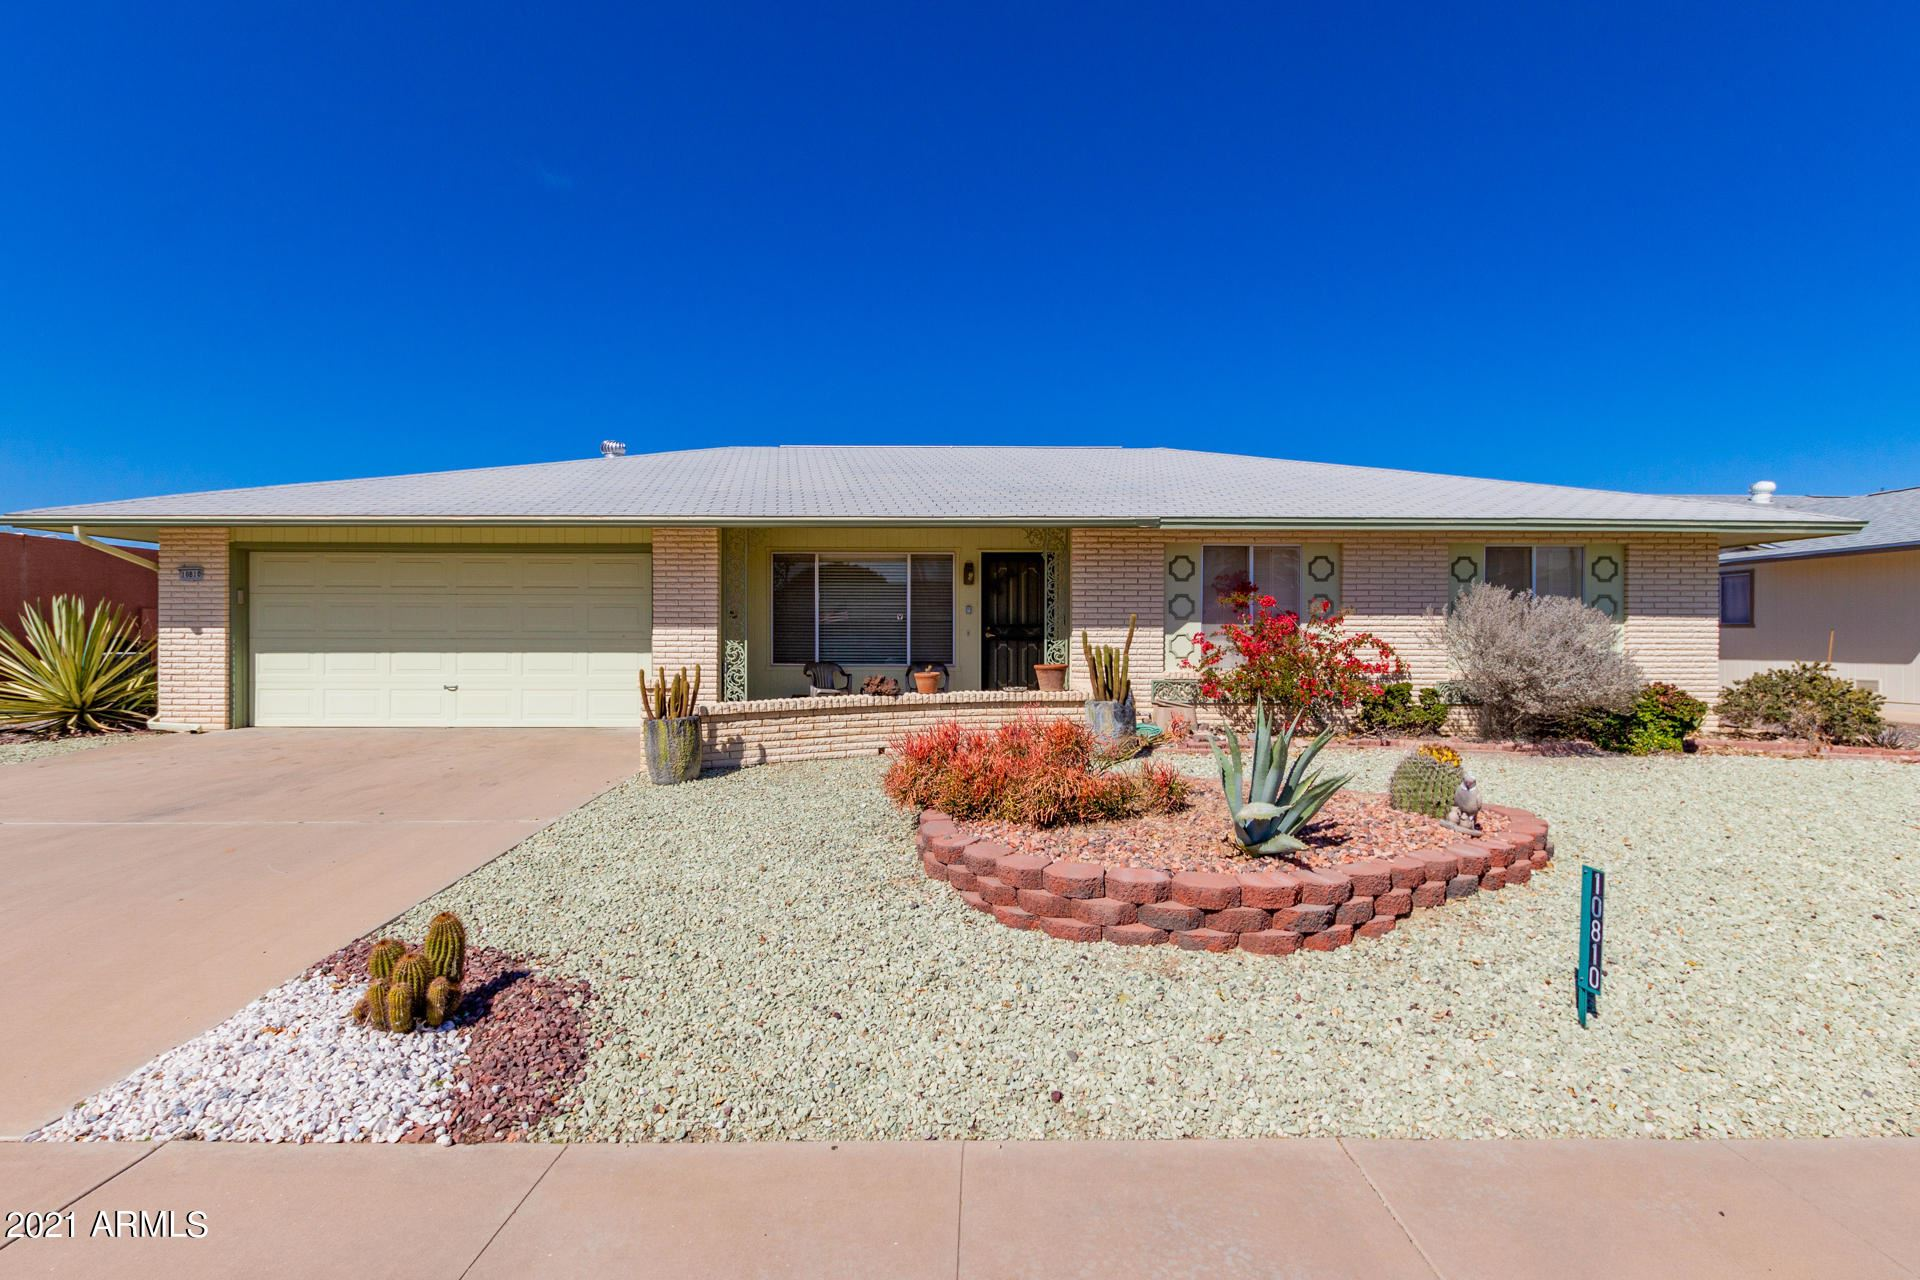 Photo of 10810 W LOMA BLANCA Drive, Sun City, AZ 85351 (MLS # 6198573)